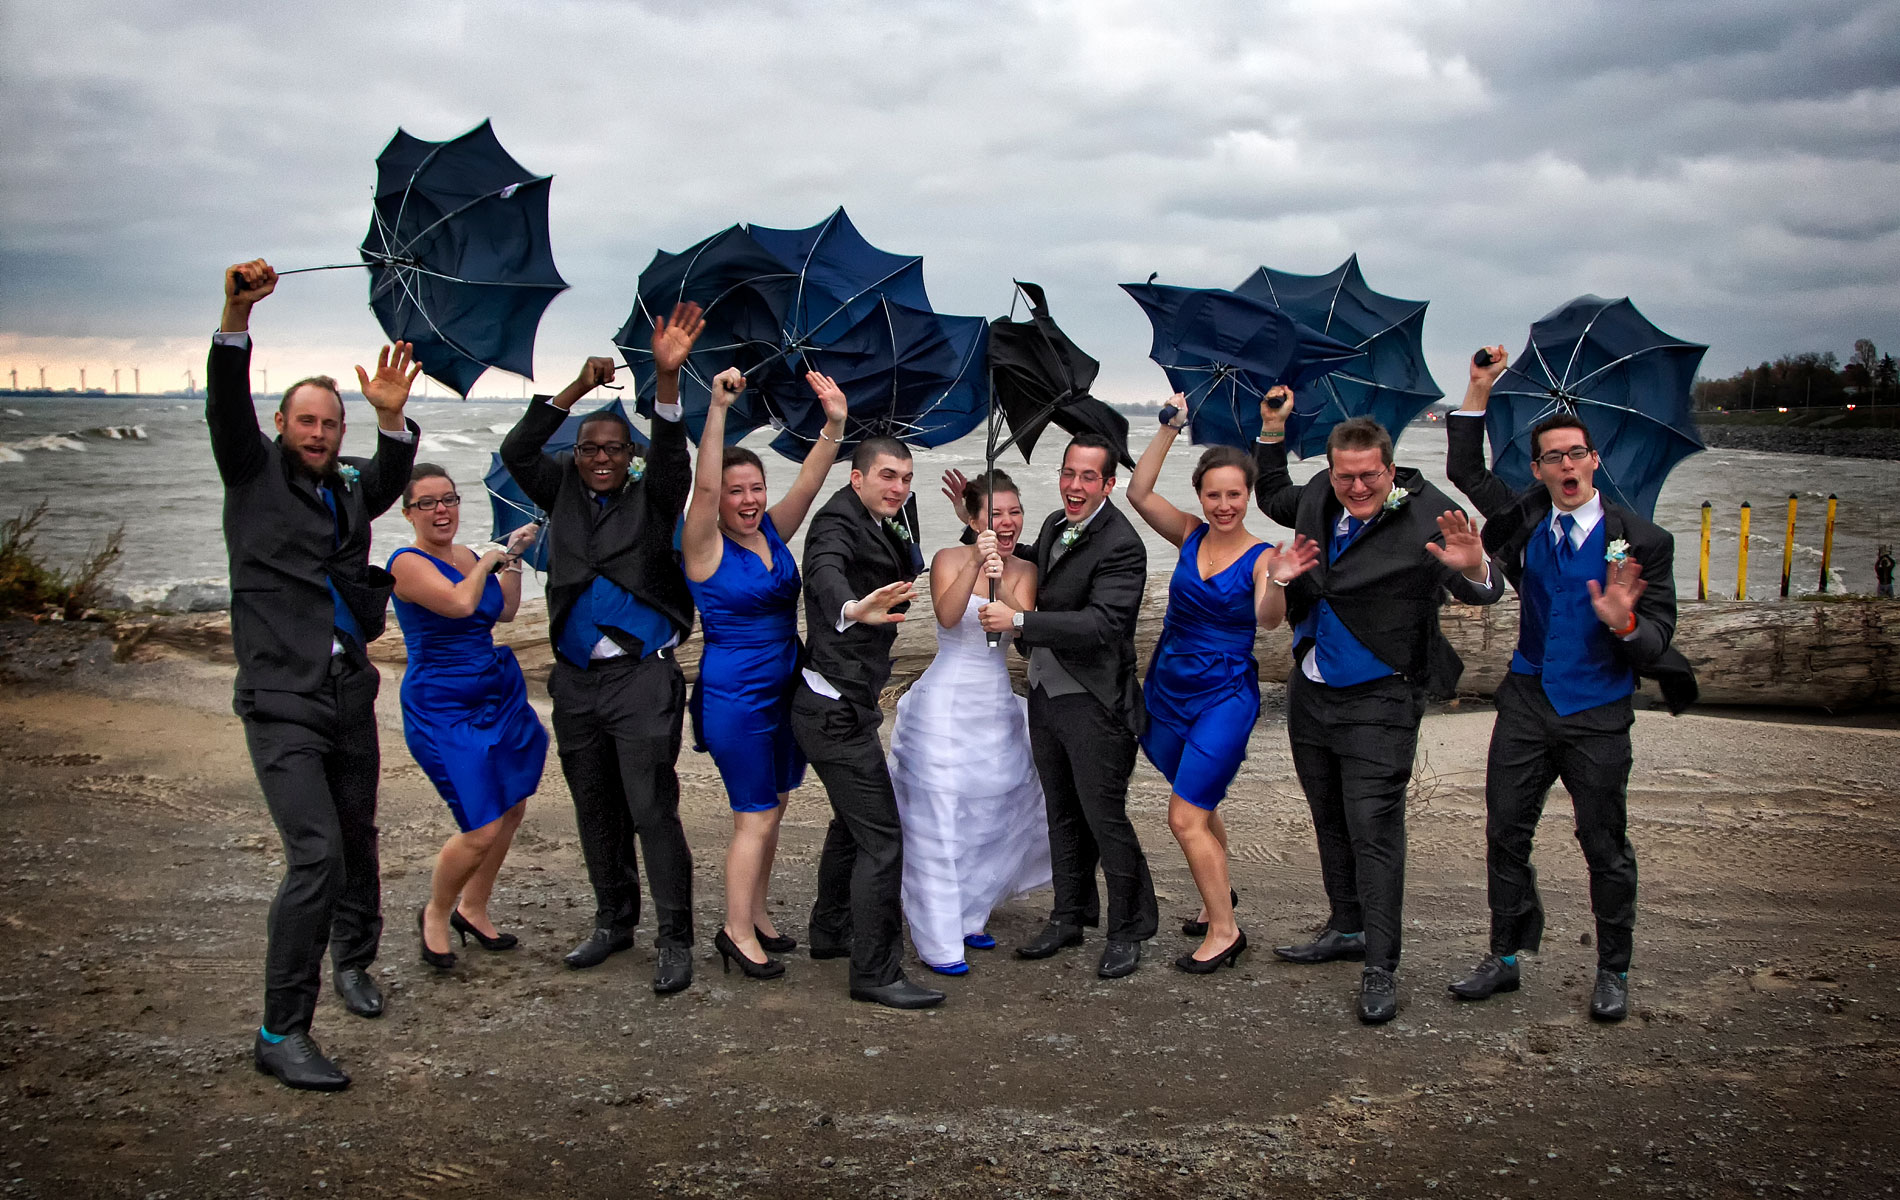 wedding-party-photo1